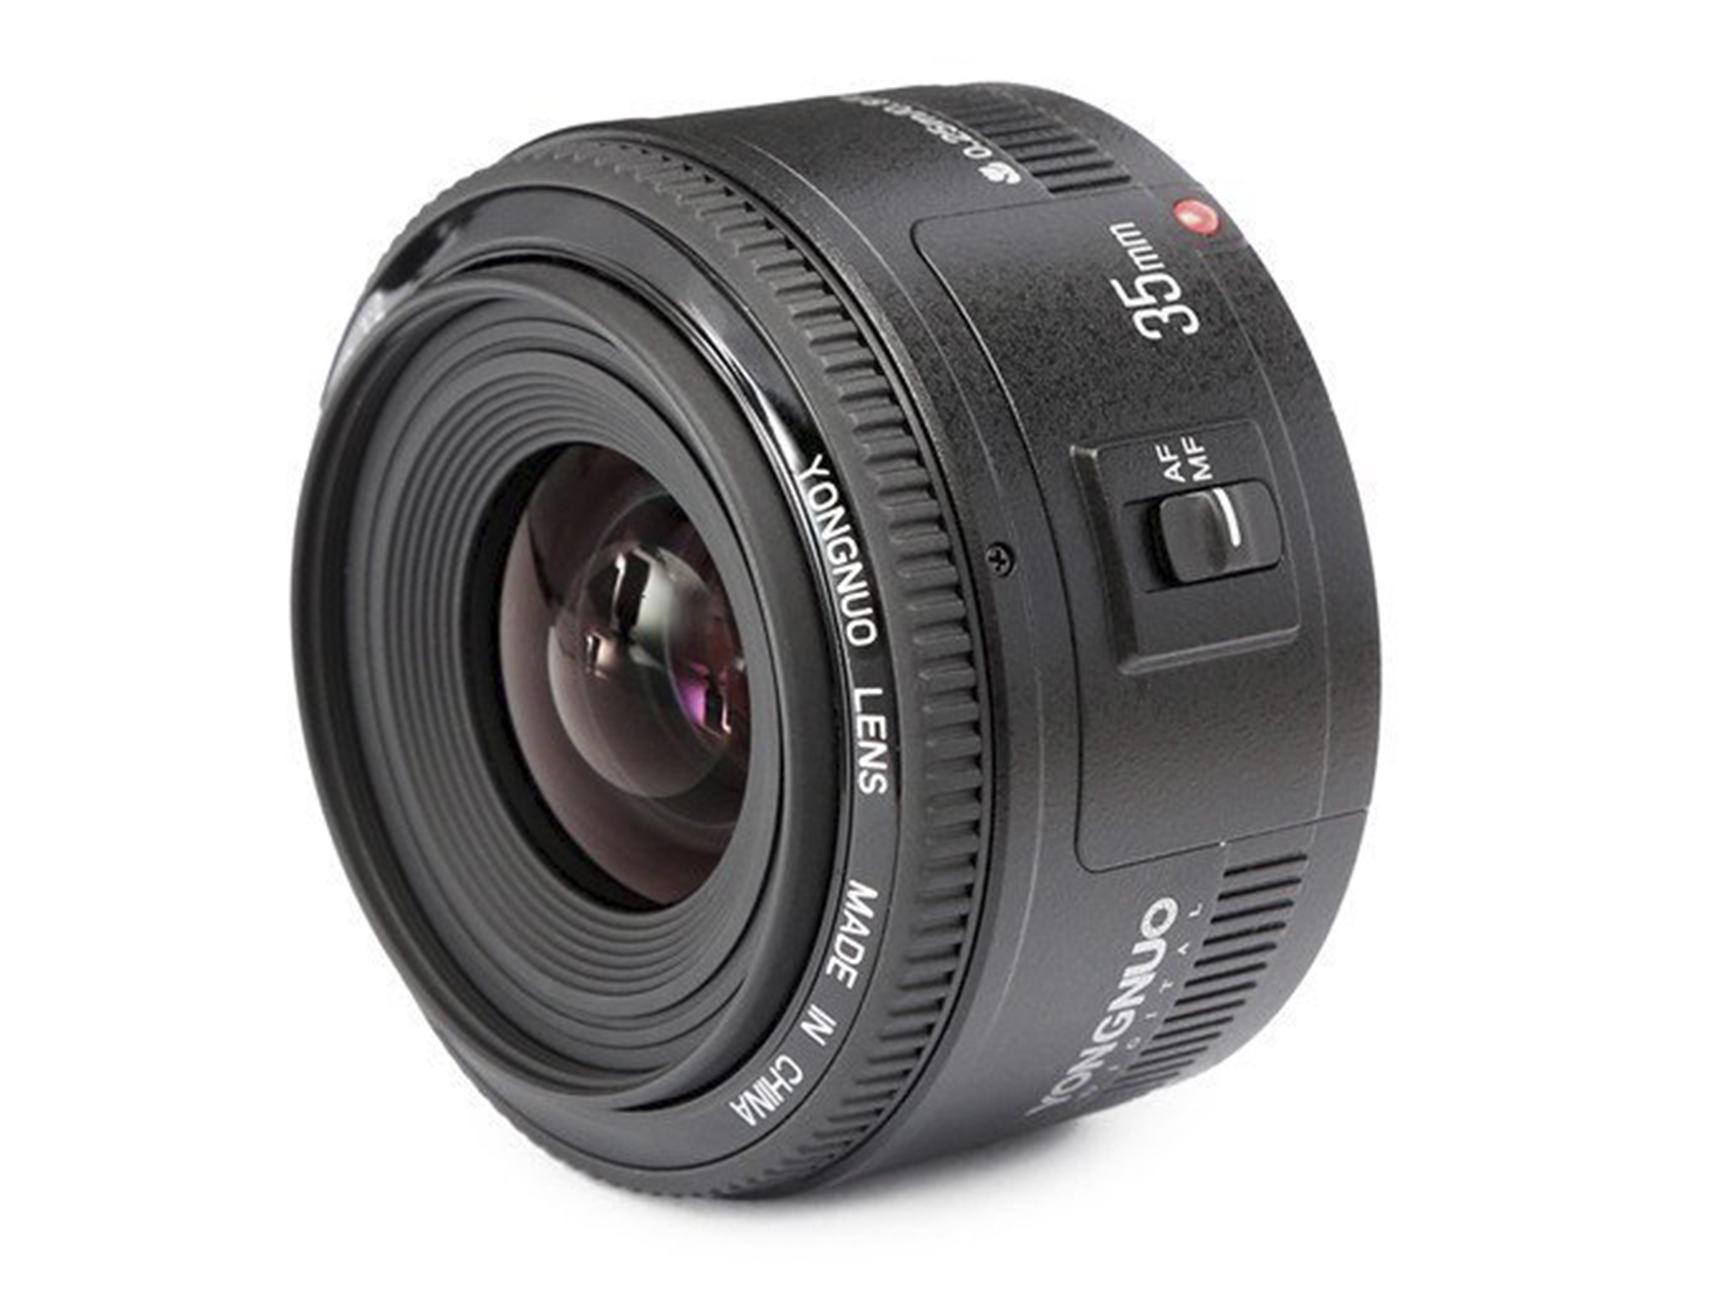 Budget YongNuo 35mm f/2, Yongnuo 35mm f2 glass cameraplex